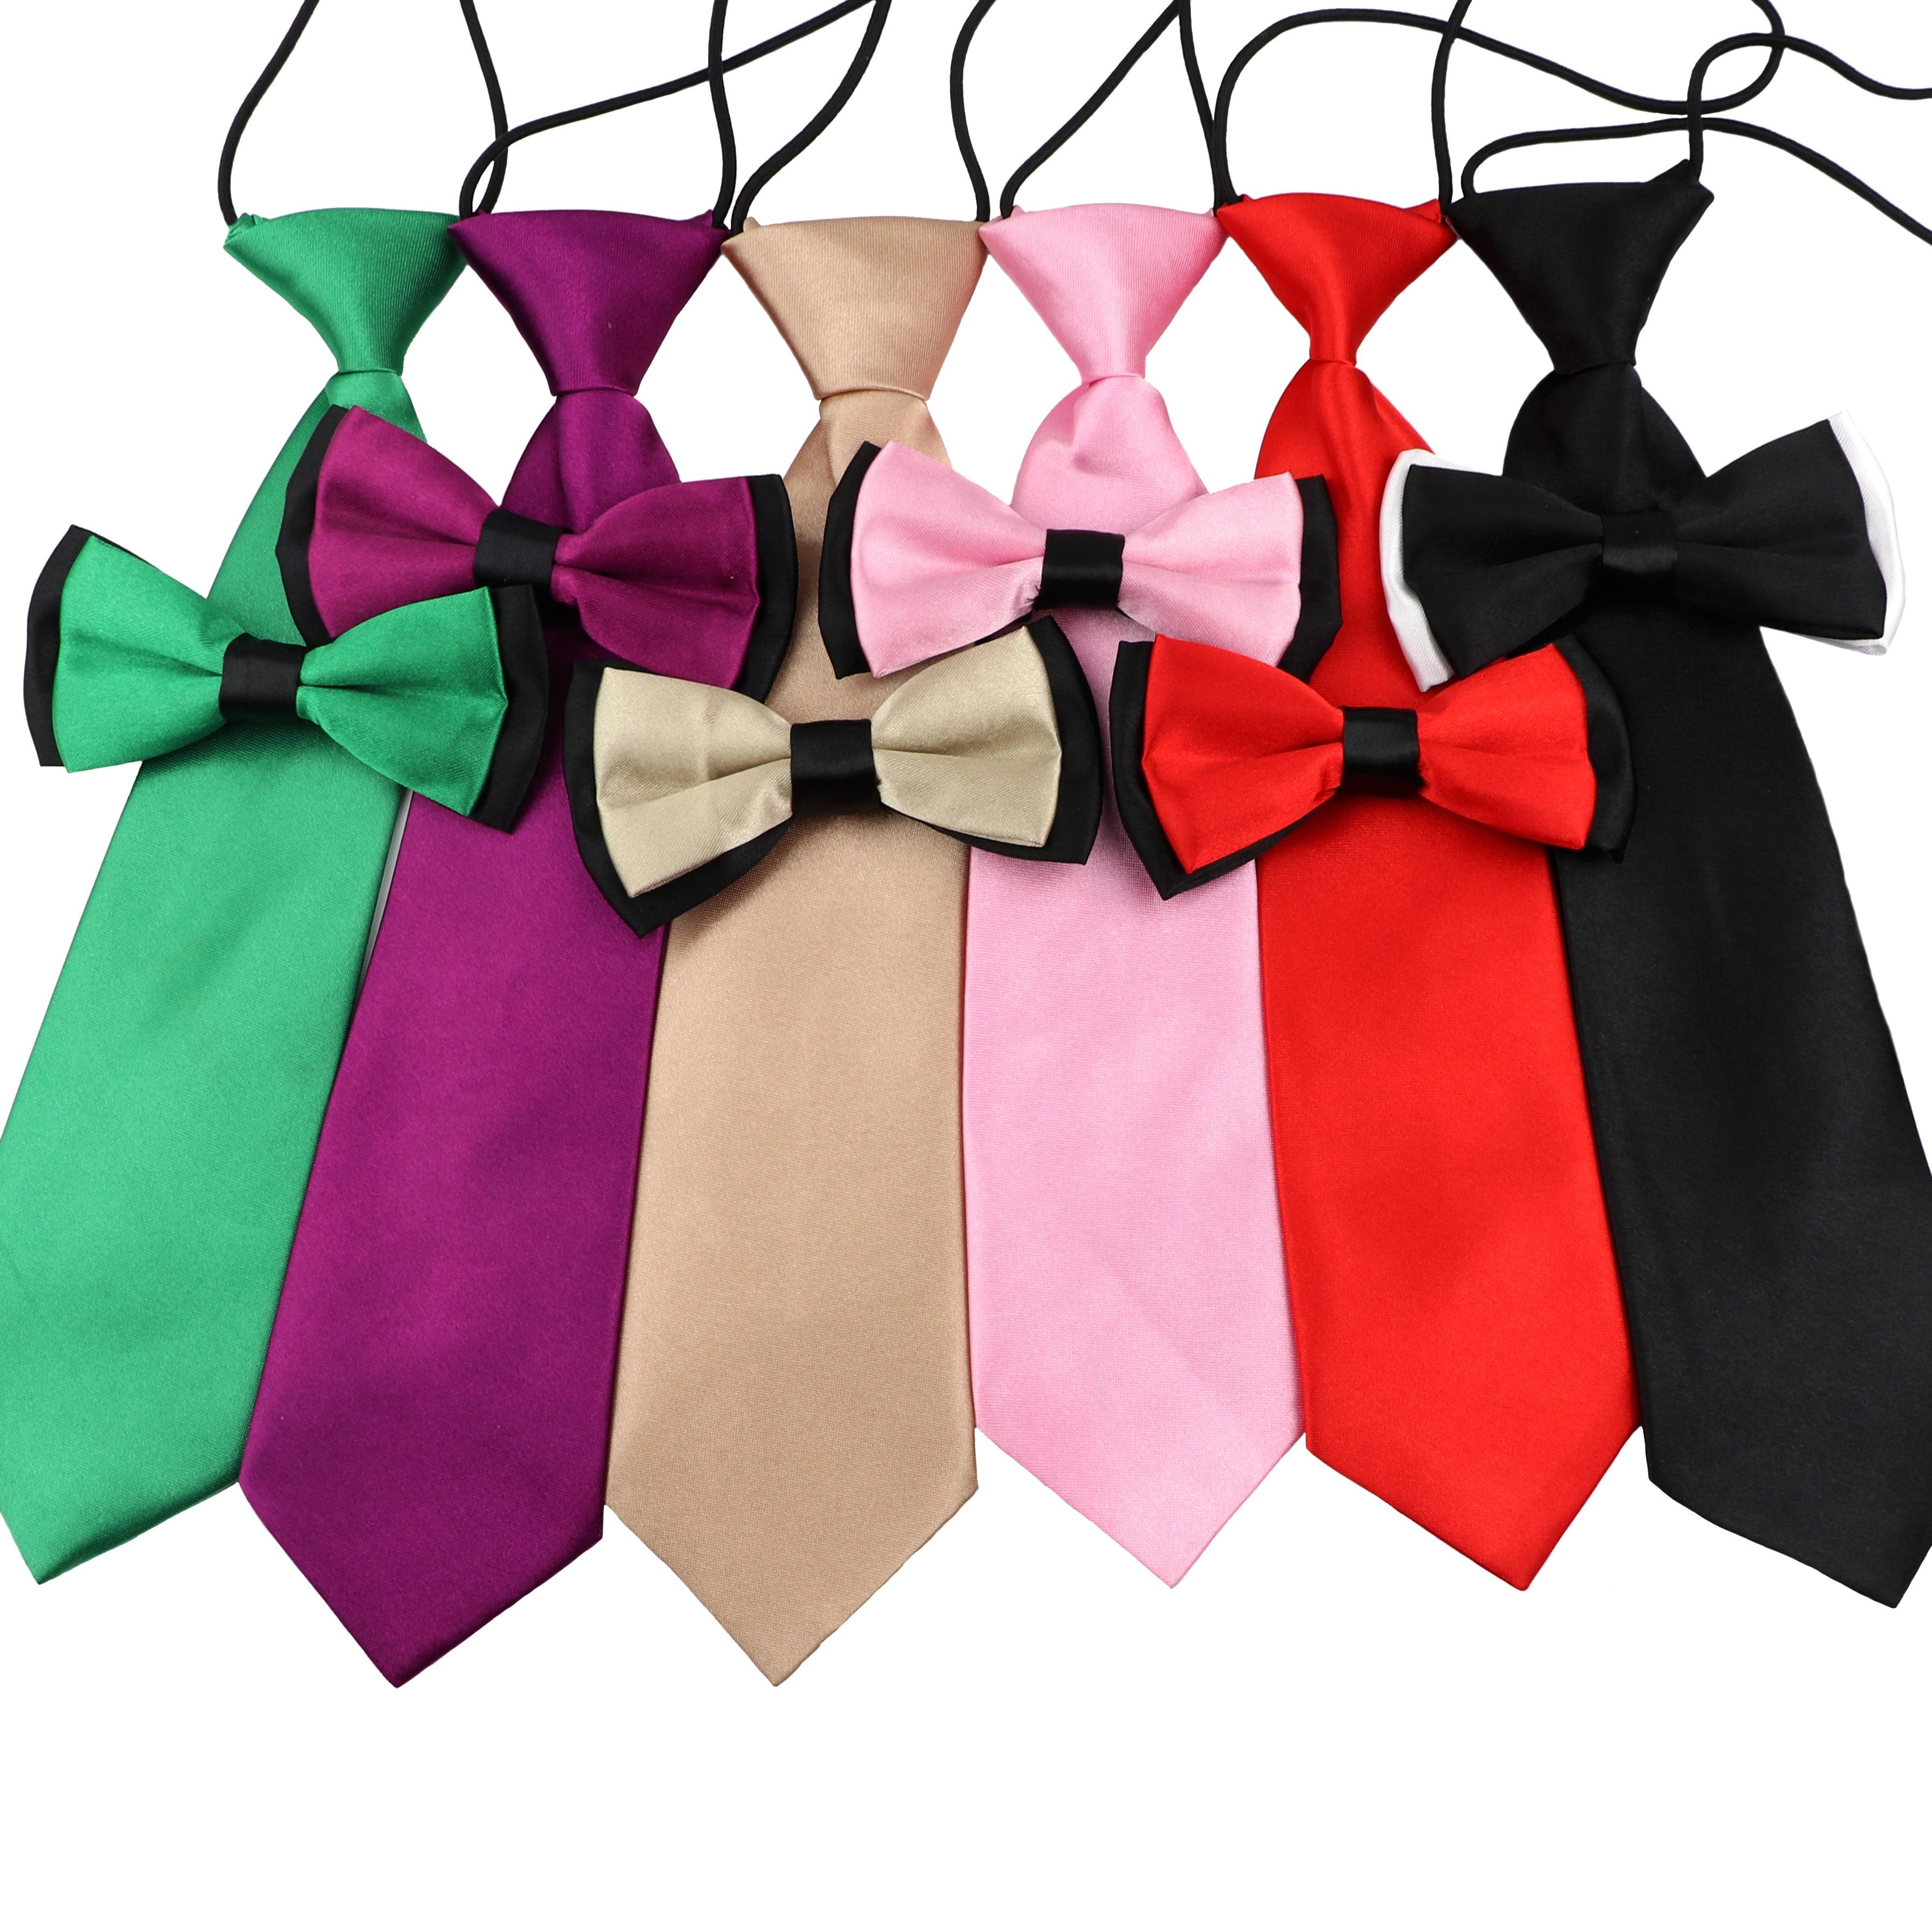 Colorful School Boys Bow Tie Set Children Kids Baby Solid Color Elastic Lazy Necktie Butterfly Design Cute Bowtie Accessory